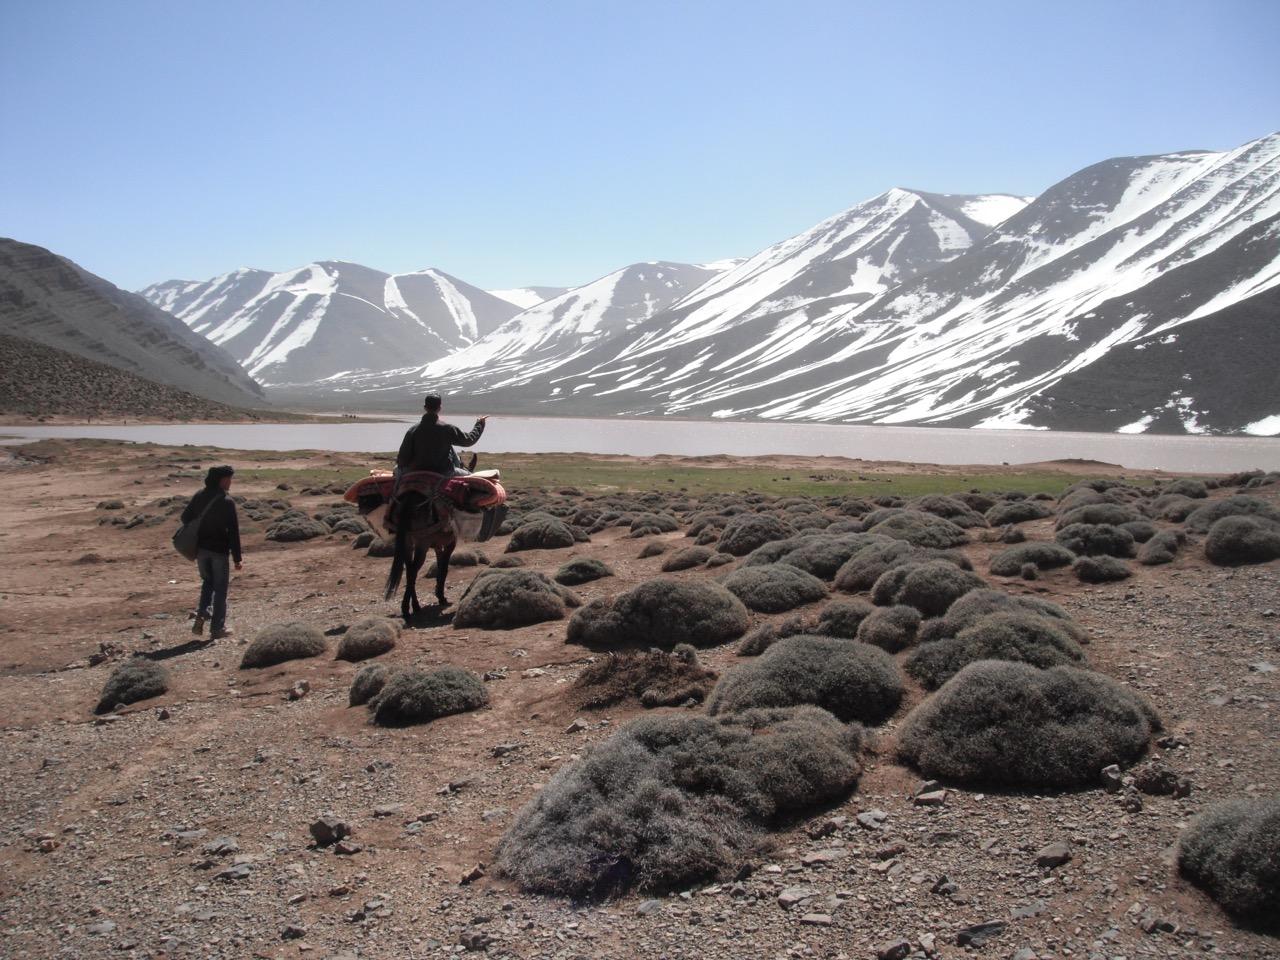 voyage maroc haut de gamme